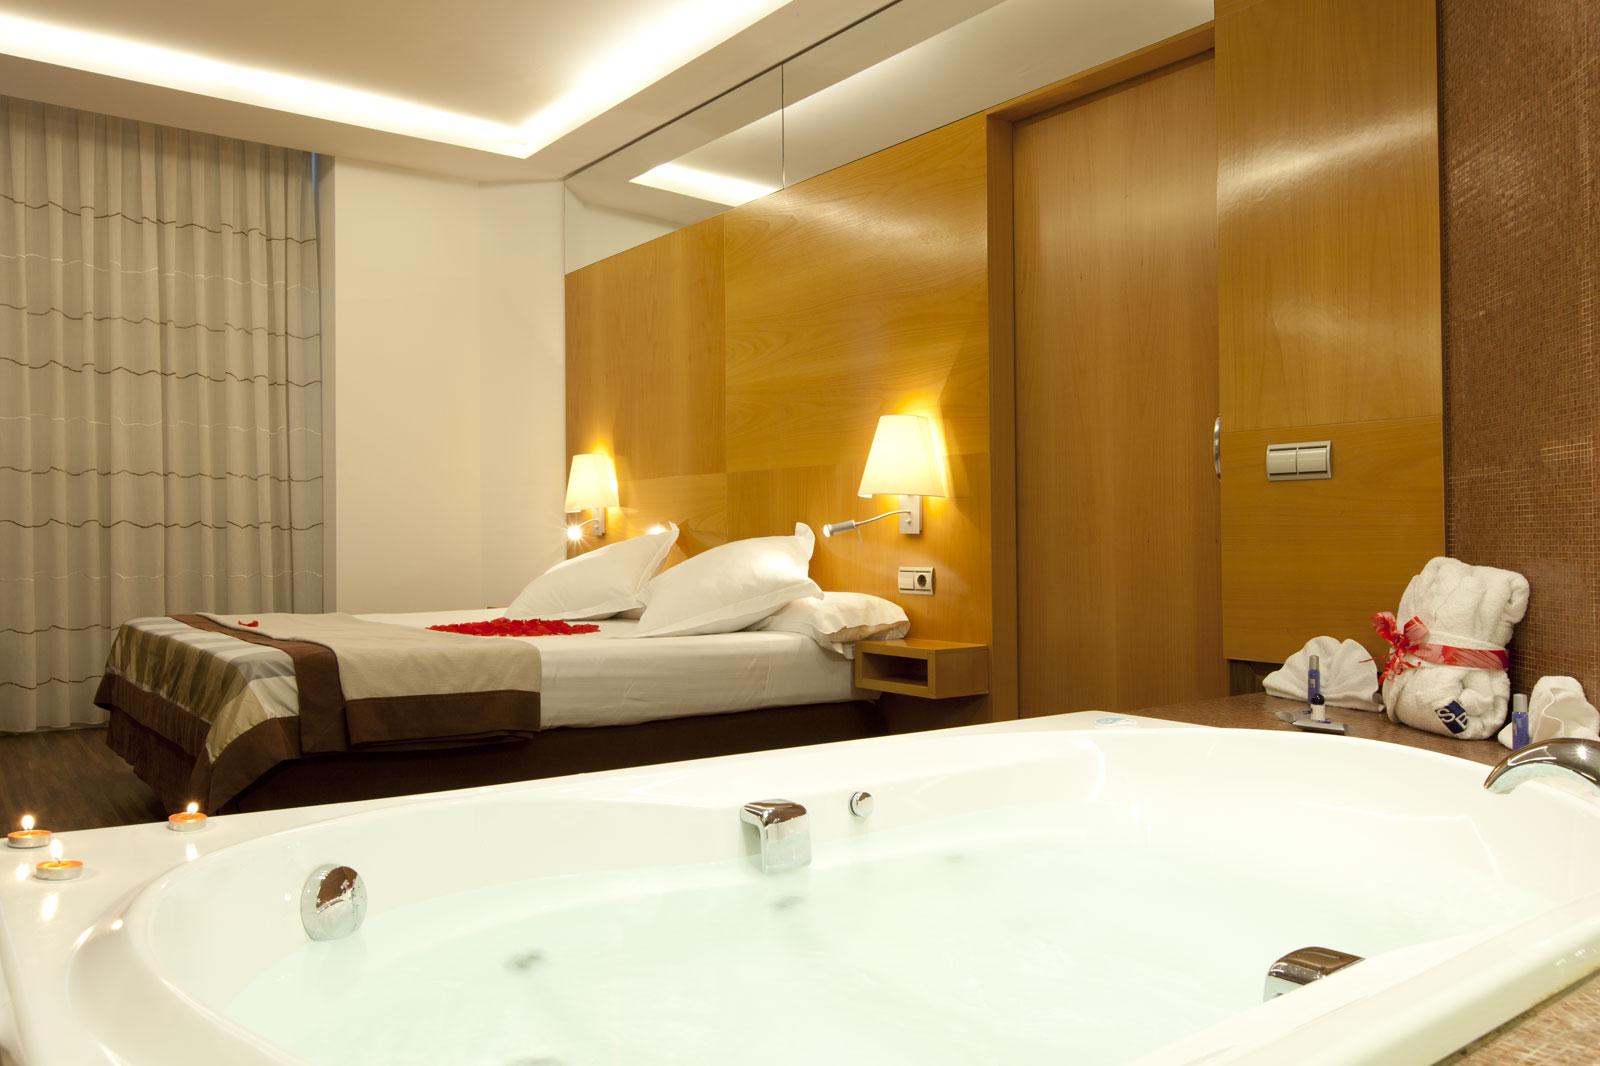 hotel de luxe a barcelone avec jacuzzi. Black Bedroom Furniture Sets. Home Design Ideas